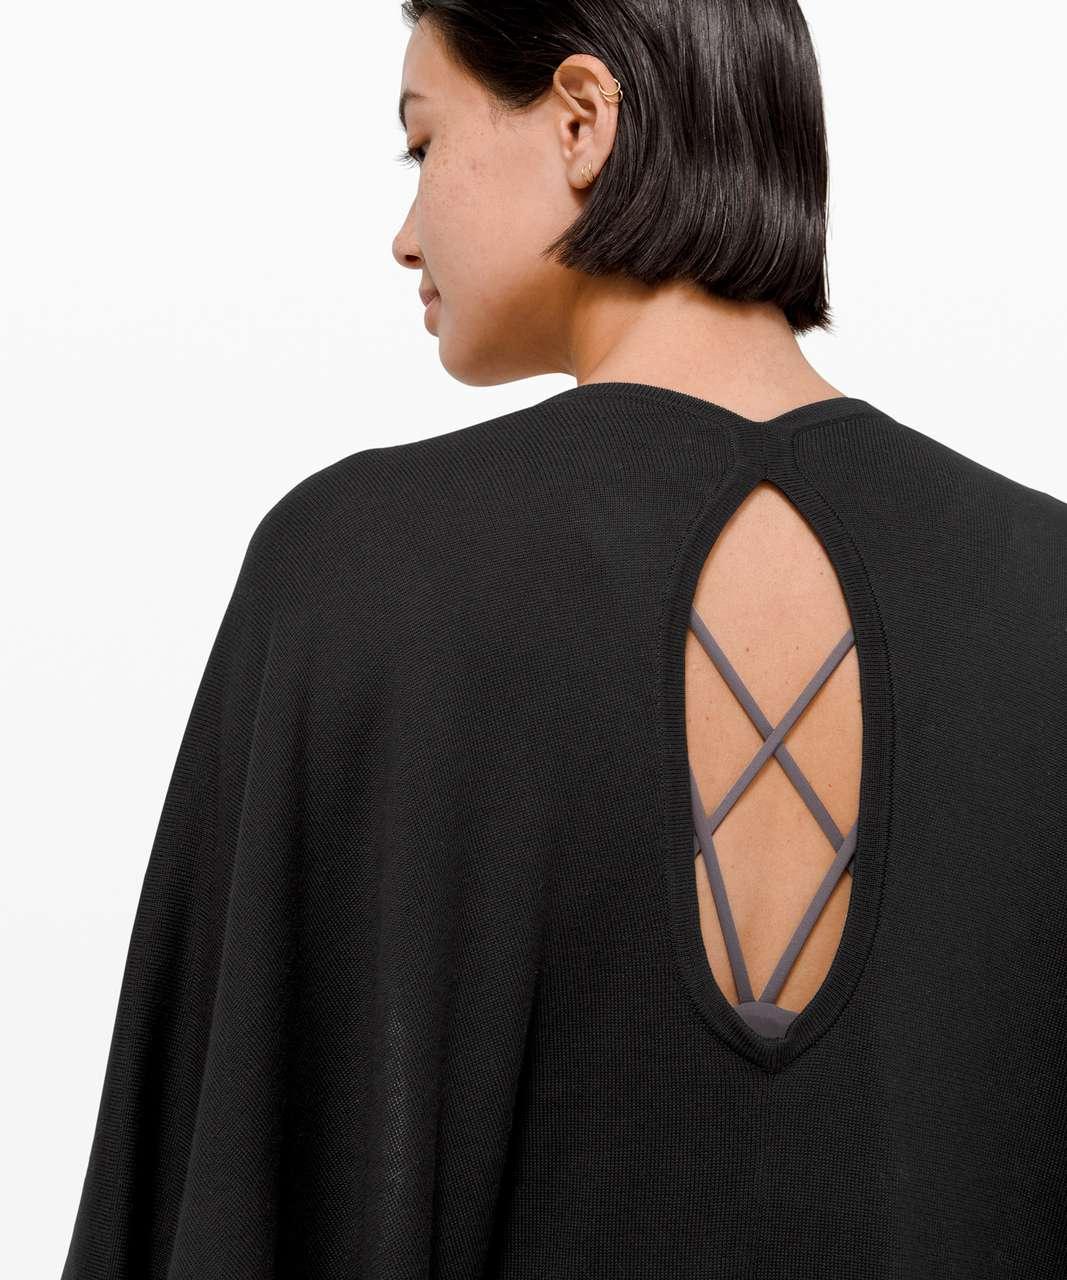 Lululemon Key to Warmth Wrap - Black